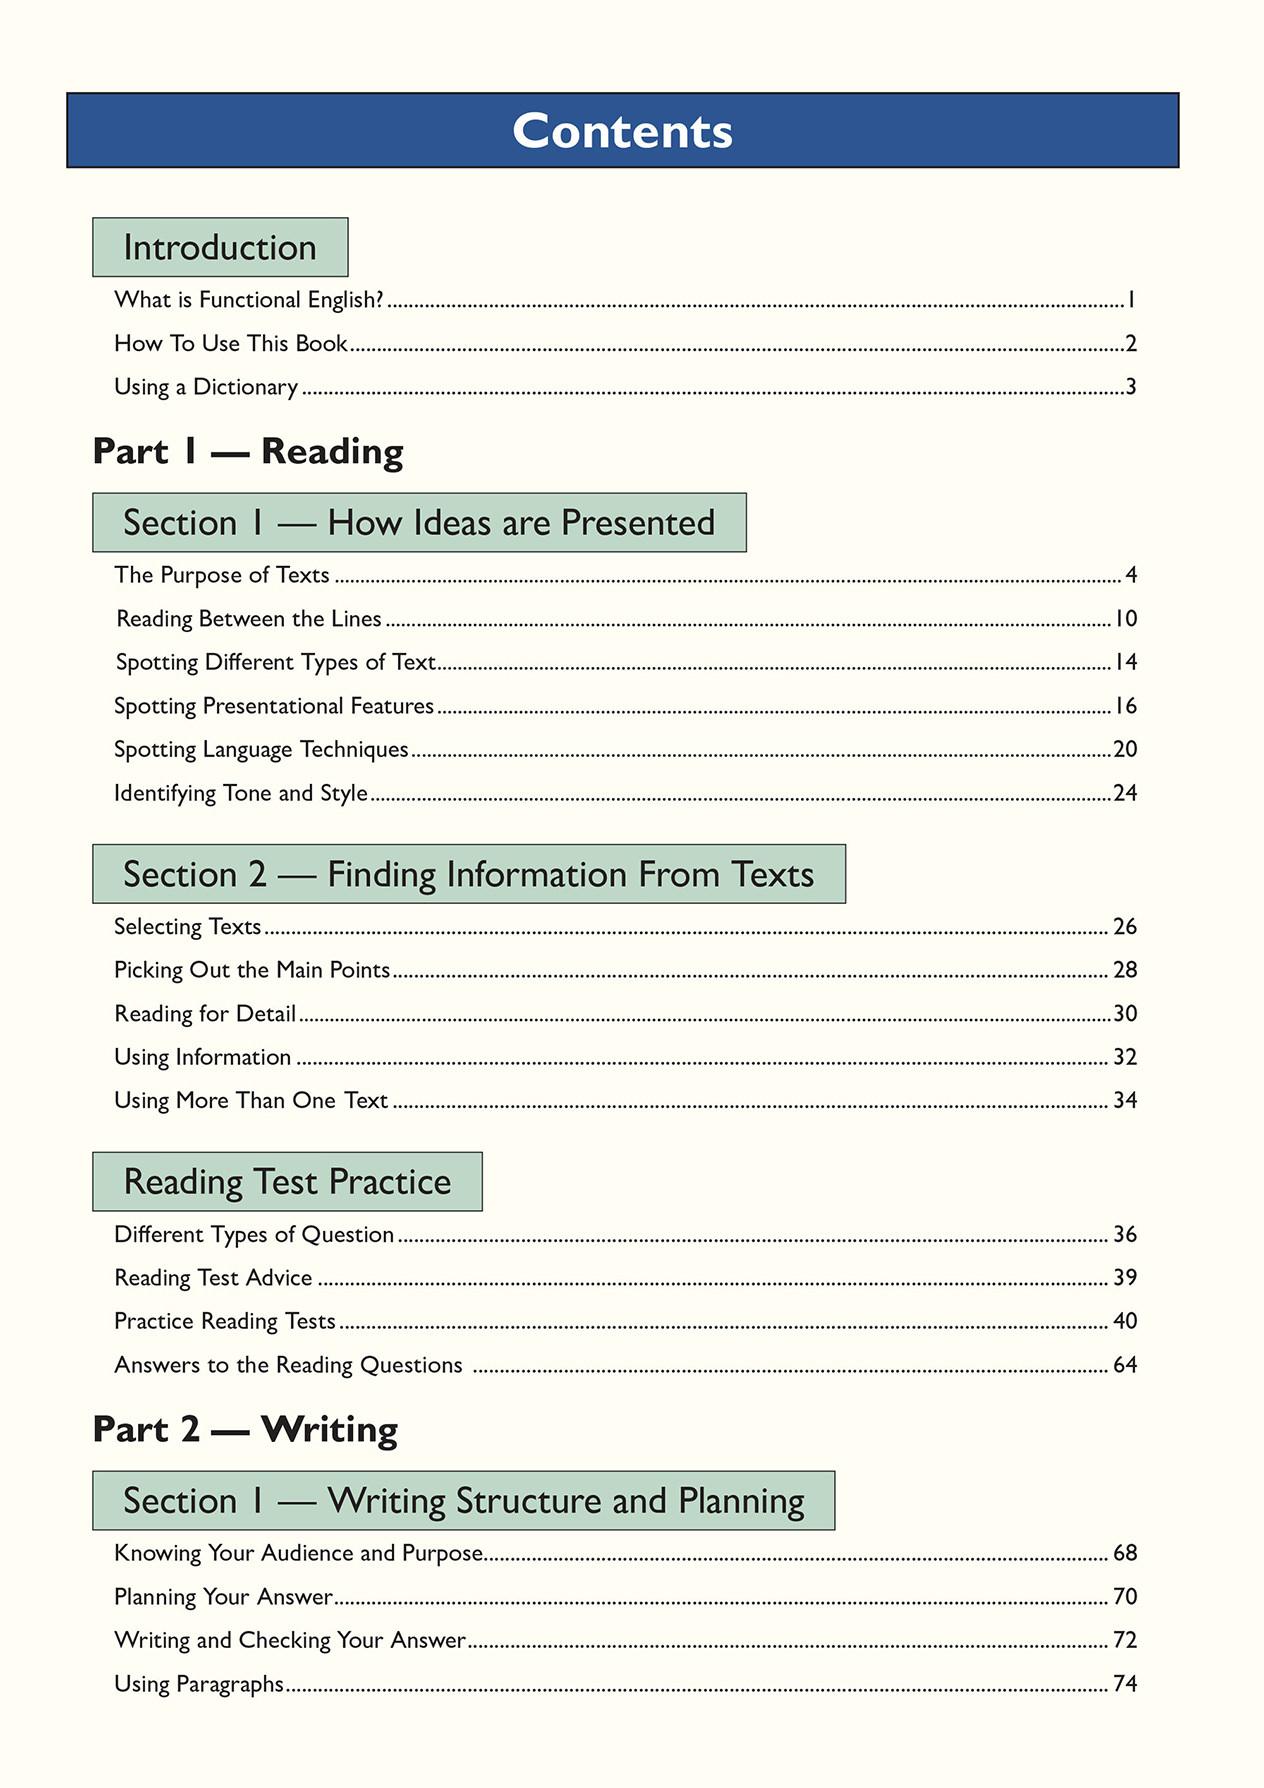 E2SRA2 - Functional Skills English Level 2 - Study & Test Practice